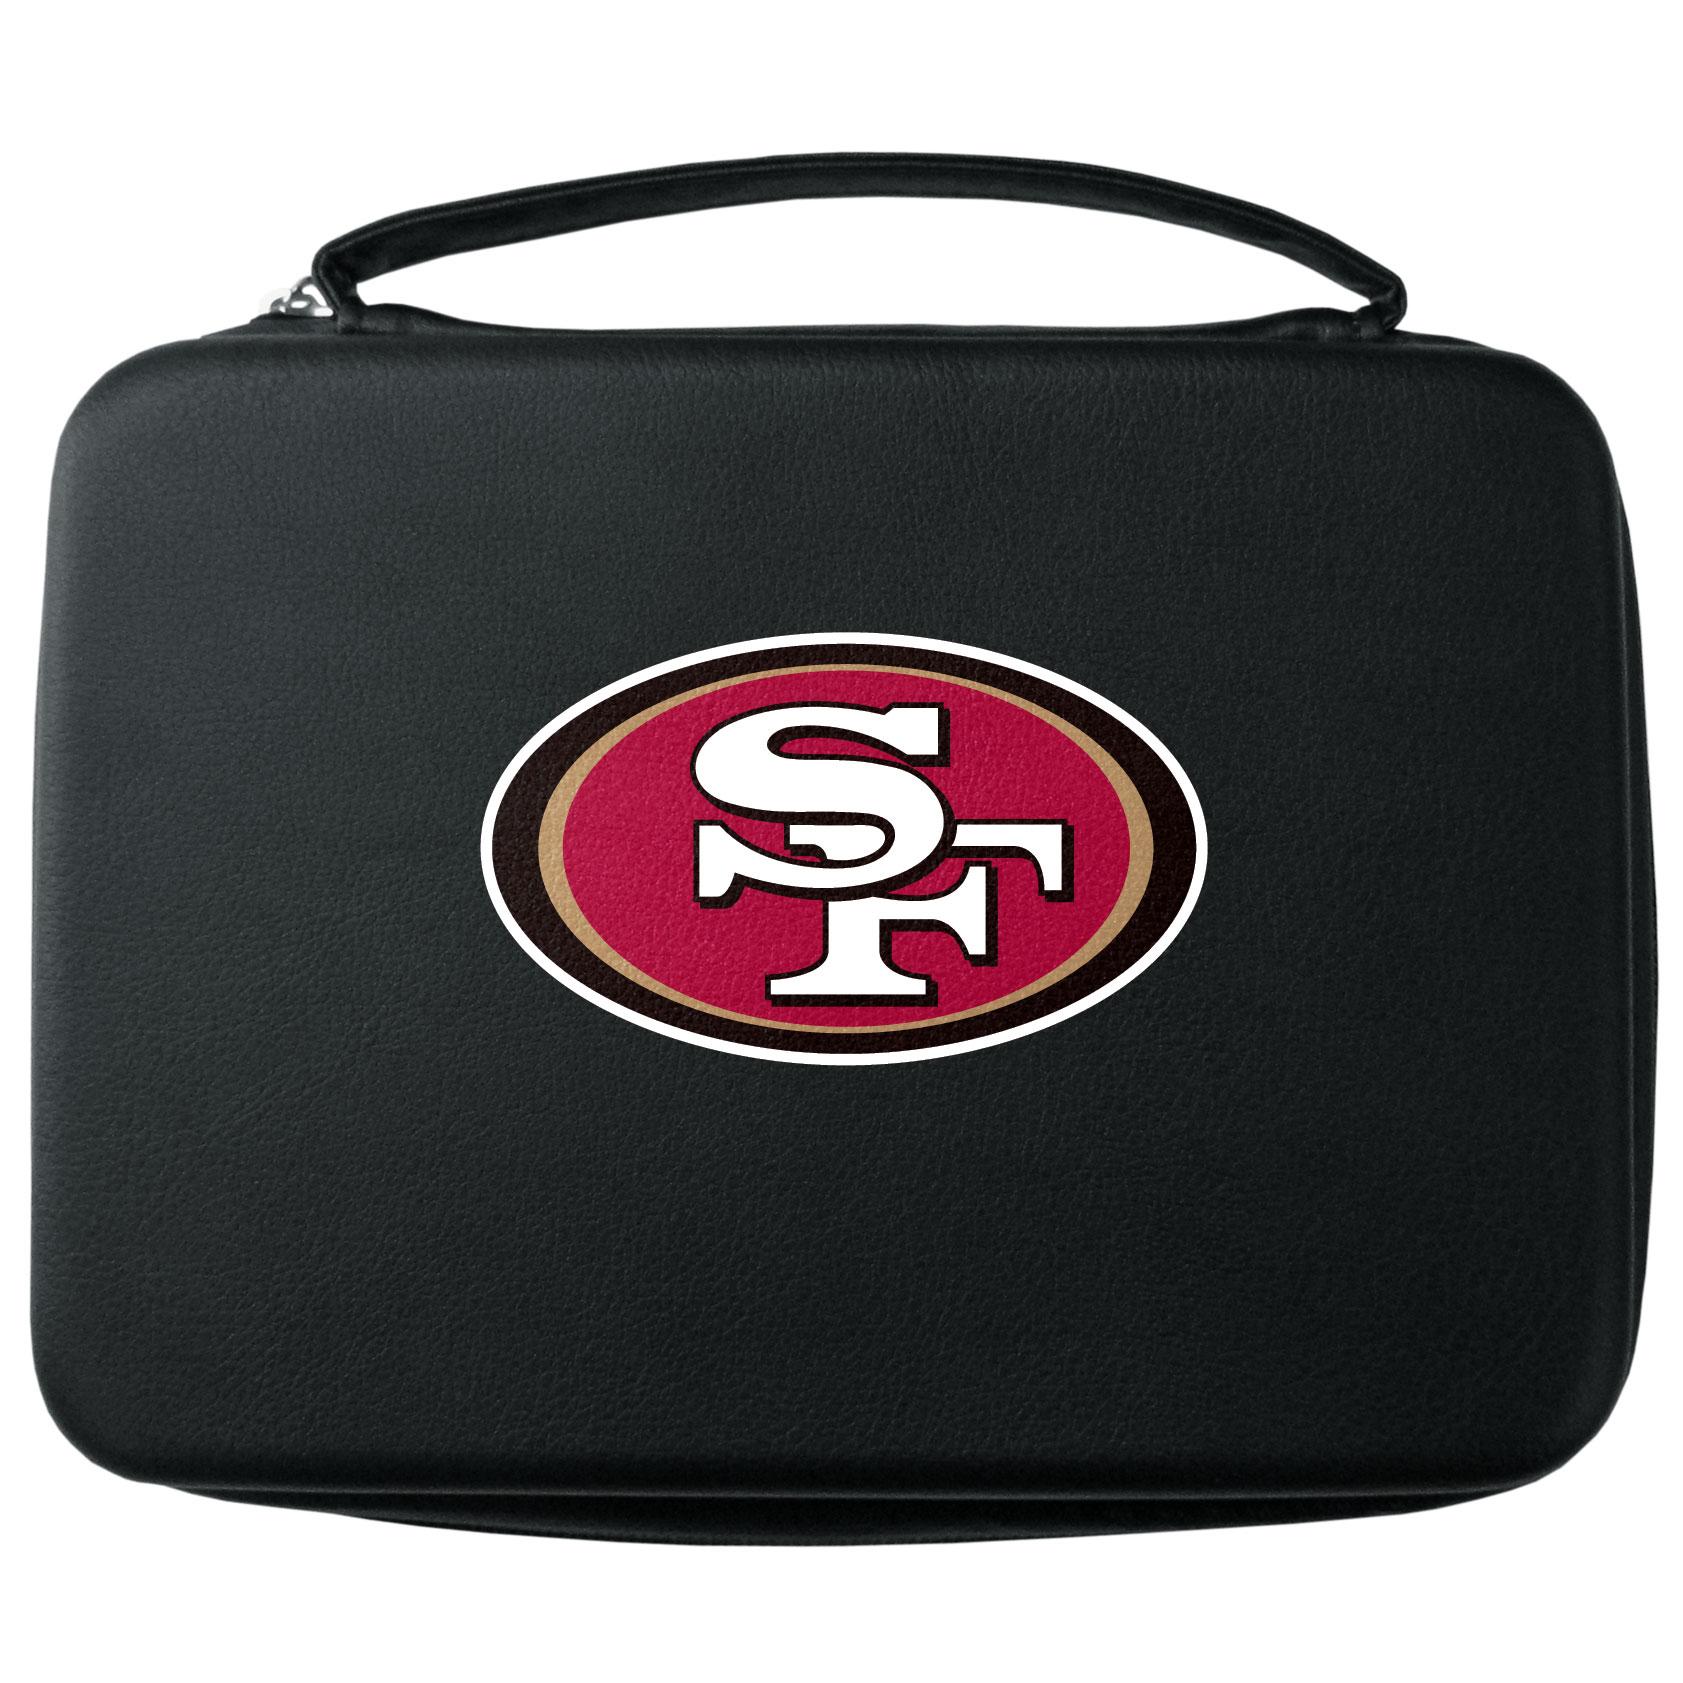 9ec0ed037e6f San Francisco 49ers GoPro Carrying Case